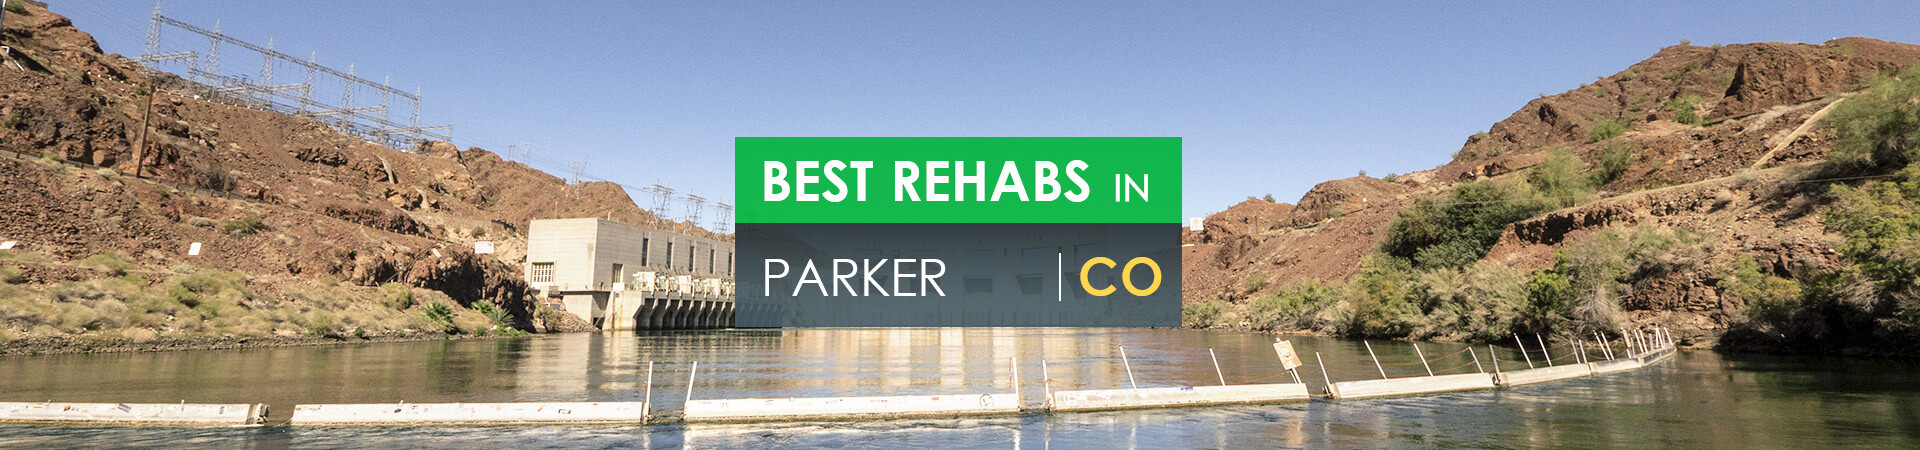 Best rehabs in Parker, CO